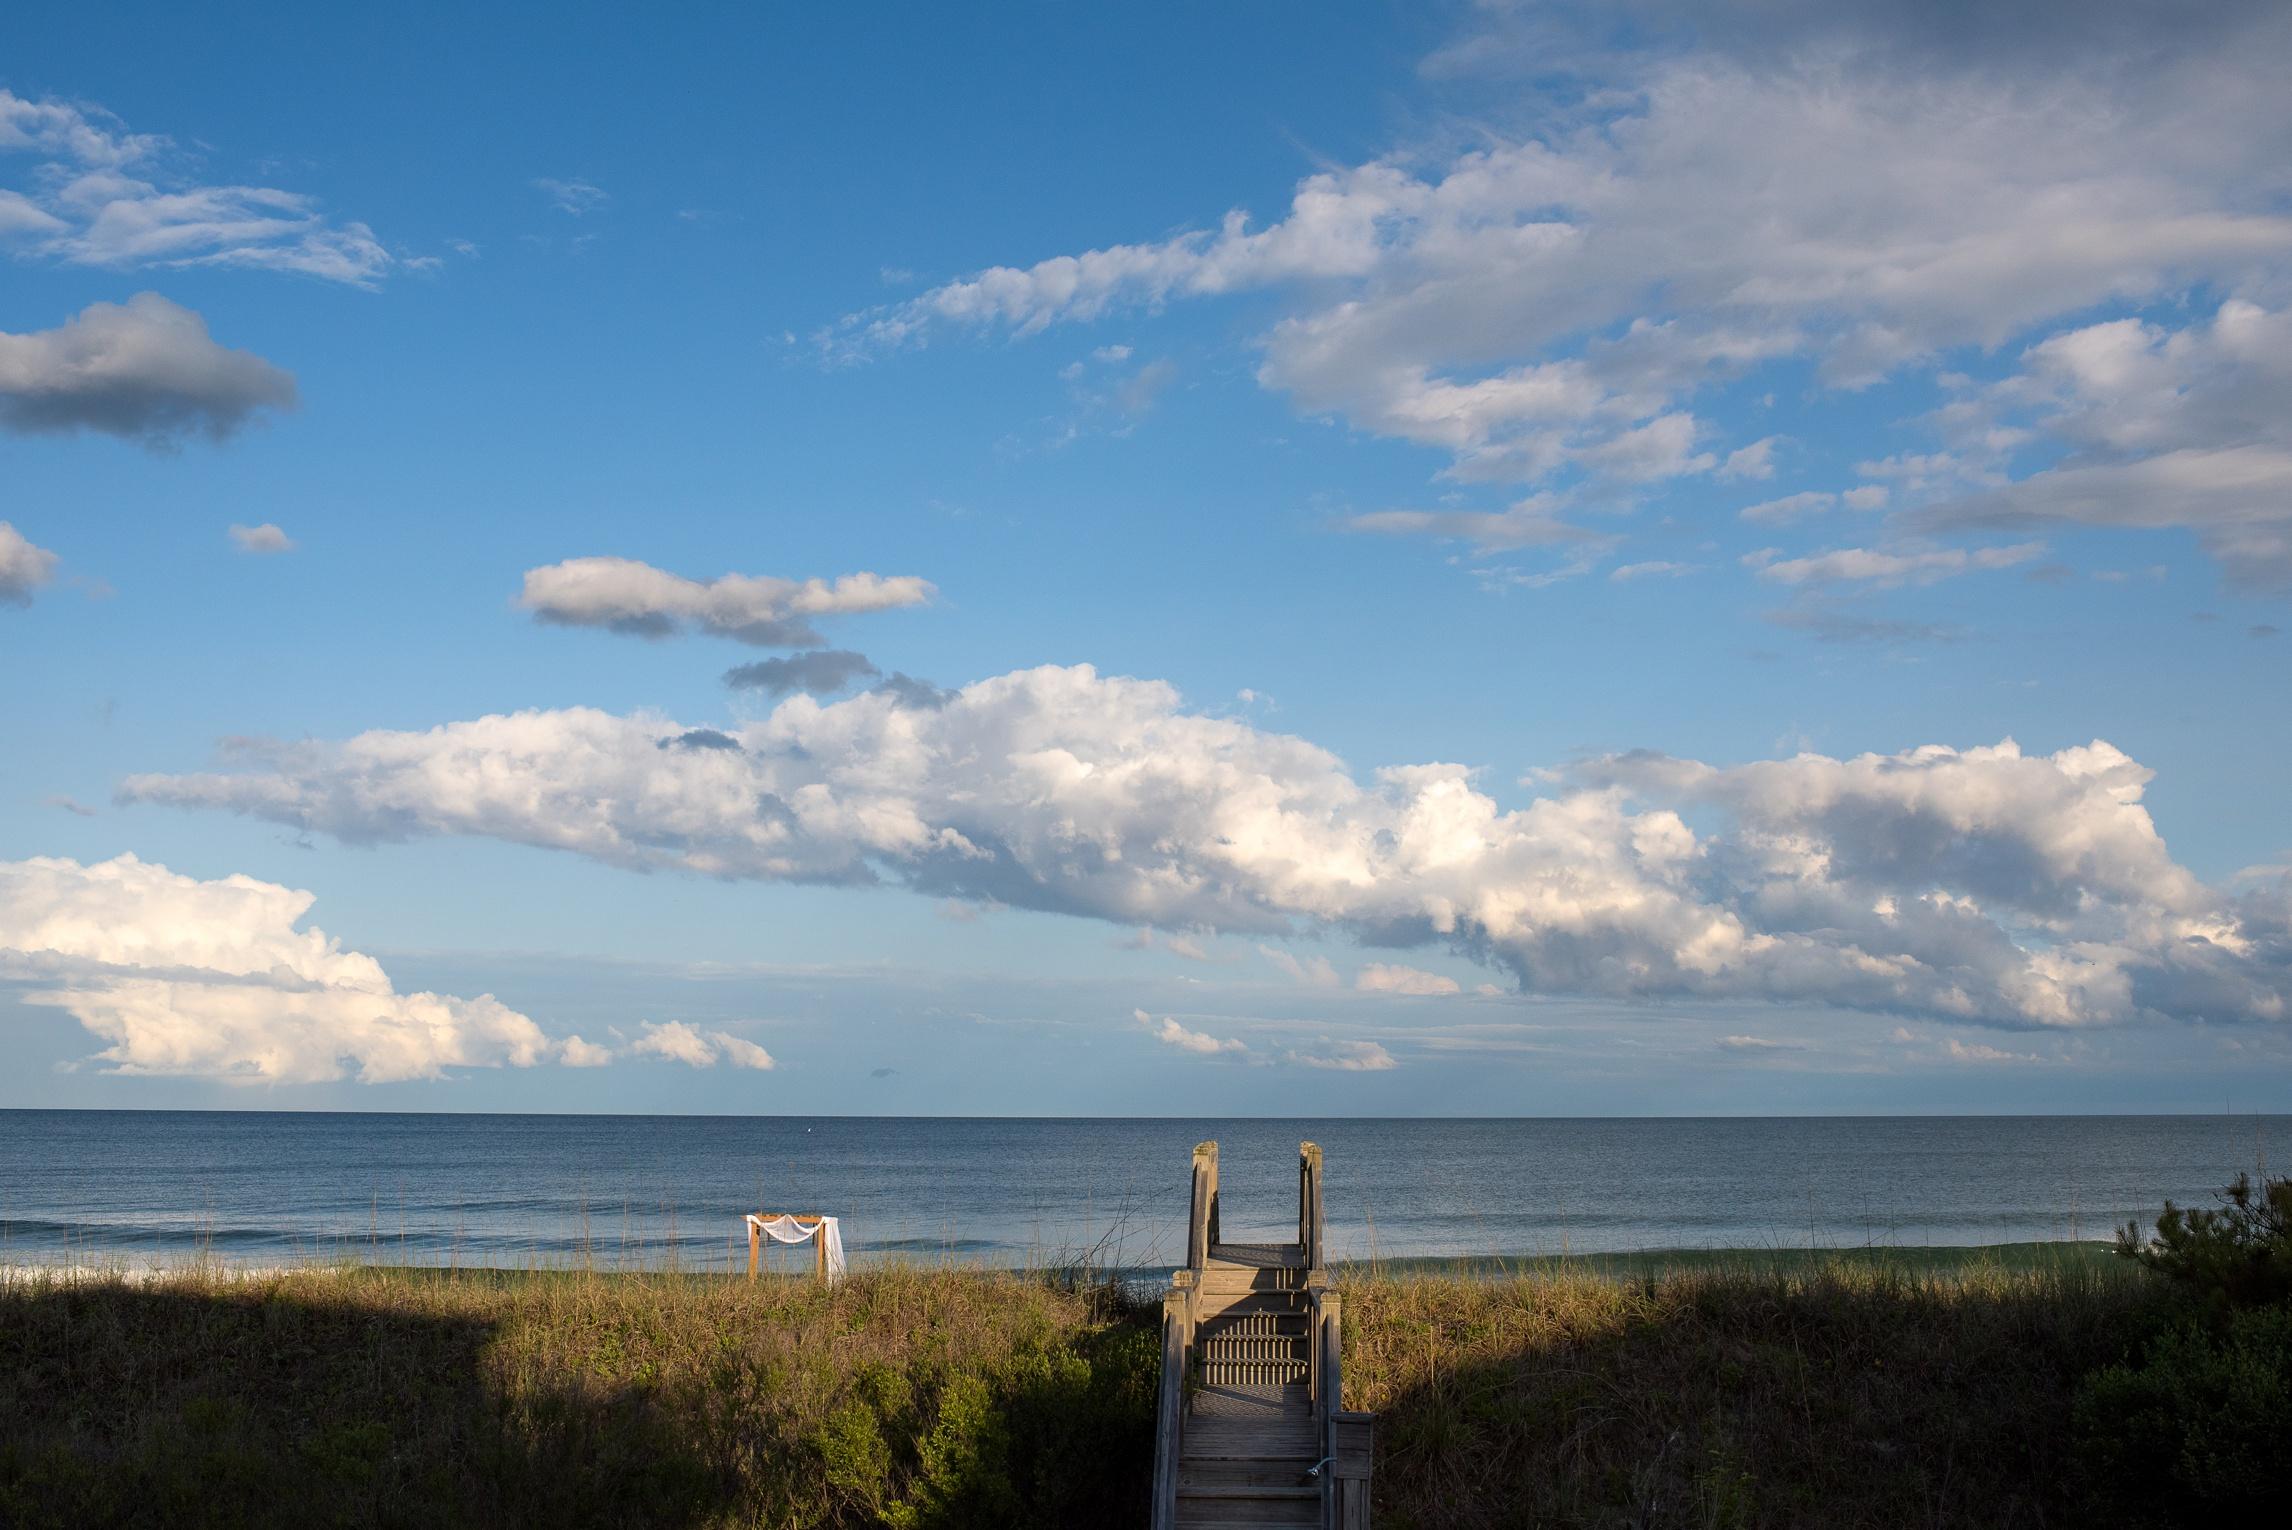 dunes-boardwalk-walkway-clouds-puffy-alter-myrtle-beach-south-carolina-Sonja-k-photography-sonjakphotography-honest-film-is-not-dead-best-fort-collins-northern-colorado-piedmont-good-creative-front-range-wedding-photographer-salzburg-rocky-mountains-meet-the-plains-look-portraits-family-southern-travel-destination-wyoming-artistic-denver-boulder-natural-lgbtq-gay-new-orleans-berlin-california-oakland-bride-groom-couple-outdoor-loveland-windsor-mountain-national-park-longmont-berthoud-arbor-trellis